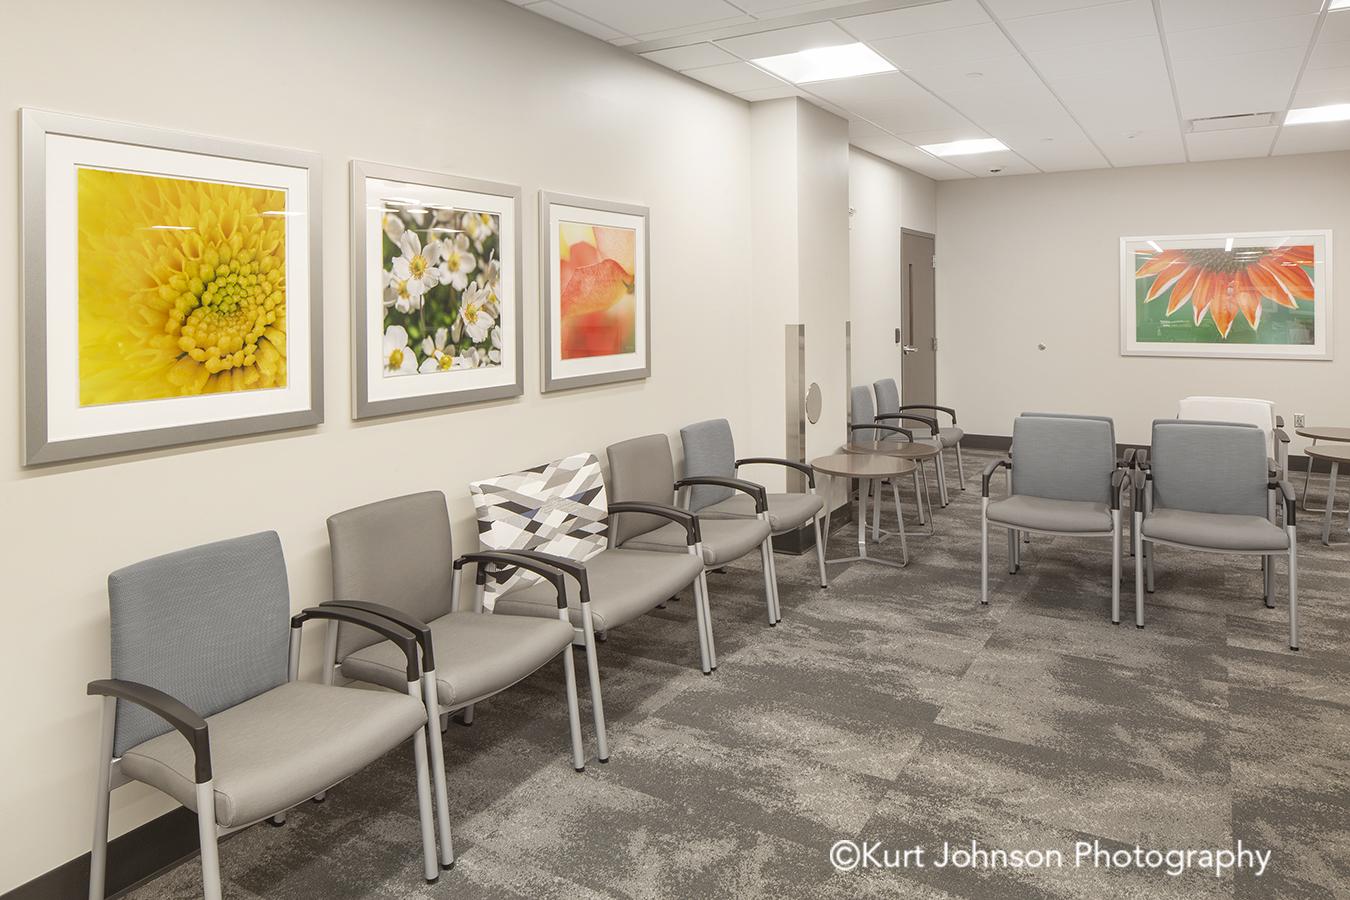 Methodist Jennie Edmundson Hospital Council Bluffs Iowa Framed Art Flower Flowers Botanicals Healthcare Installation